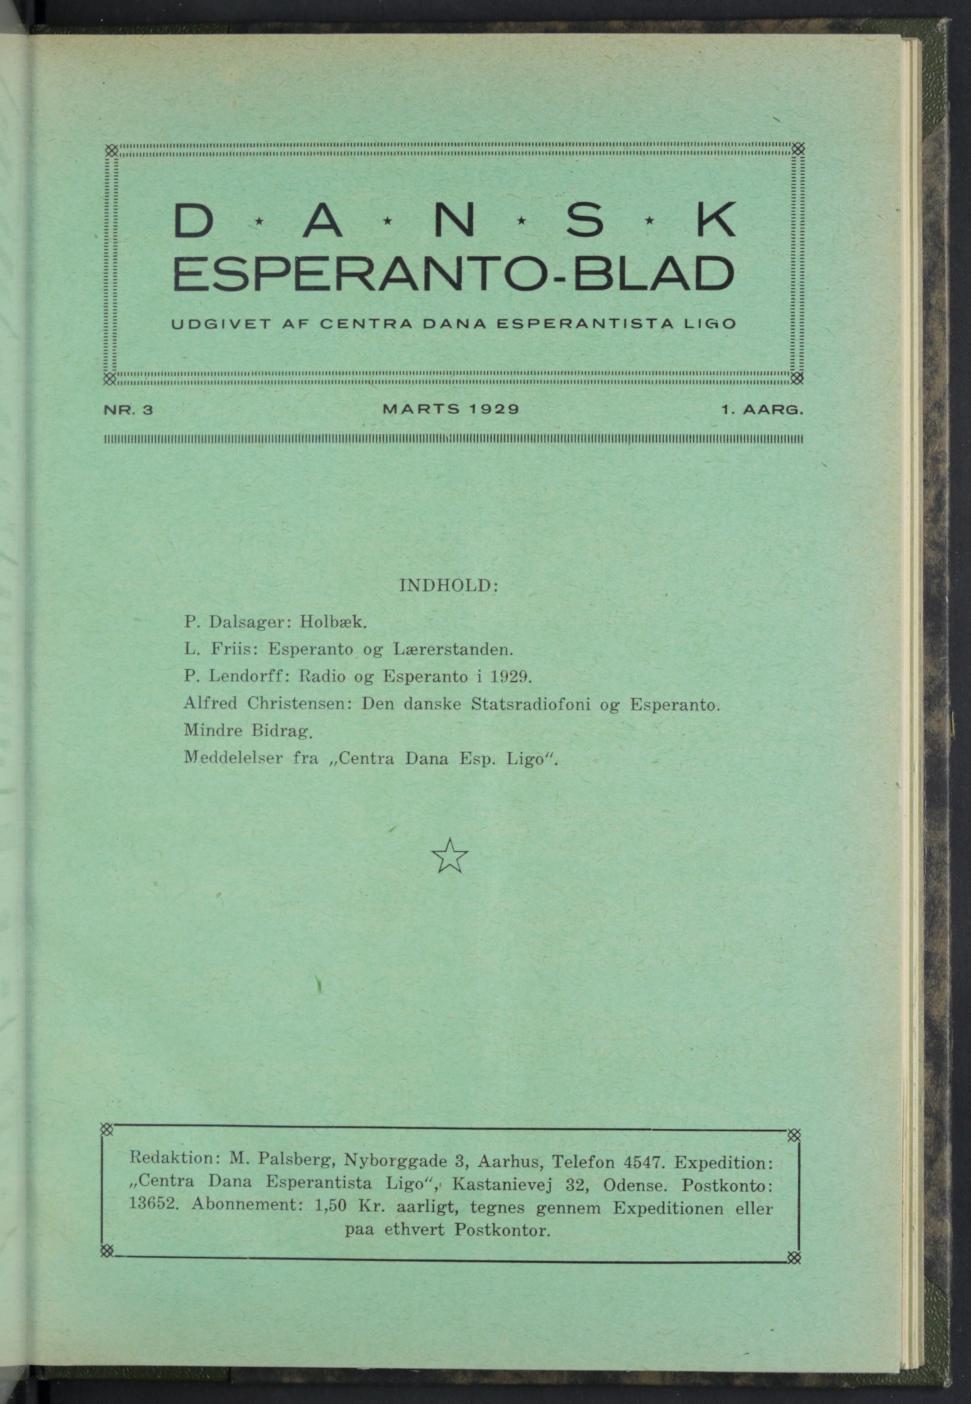 Dansk Esperanto-blad